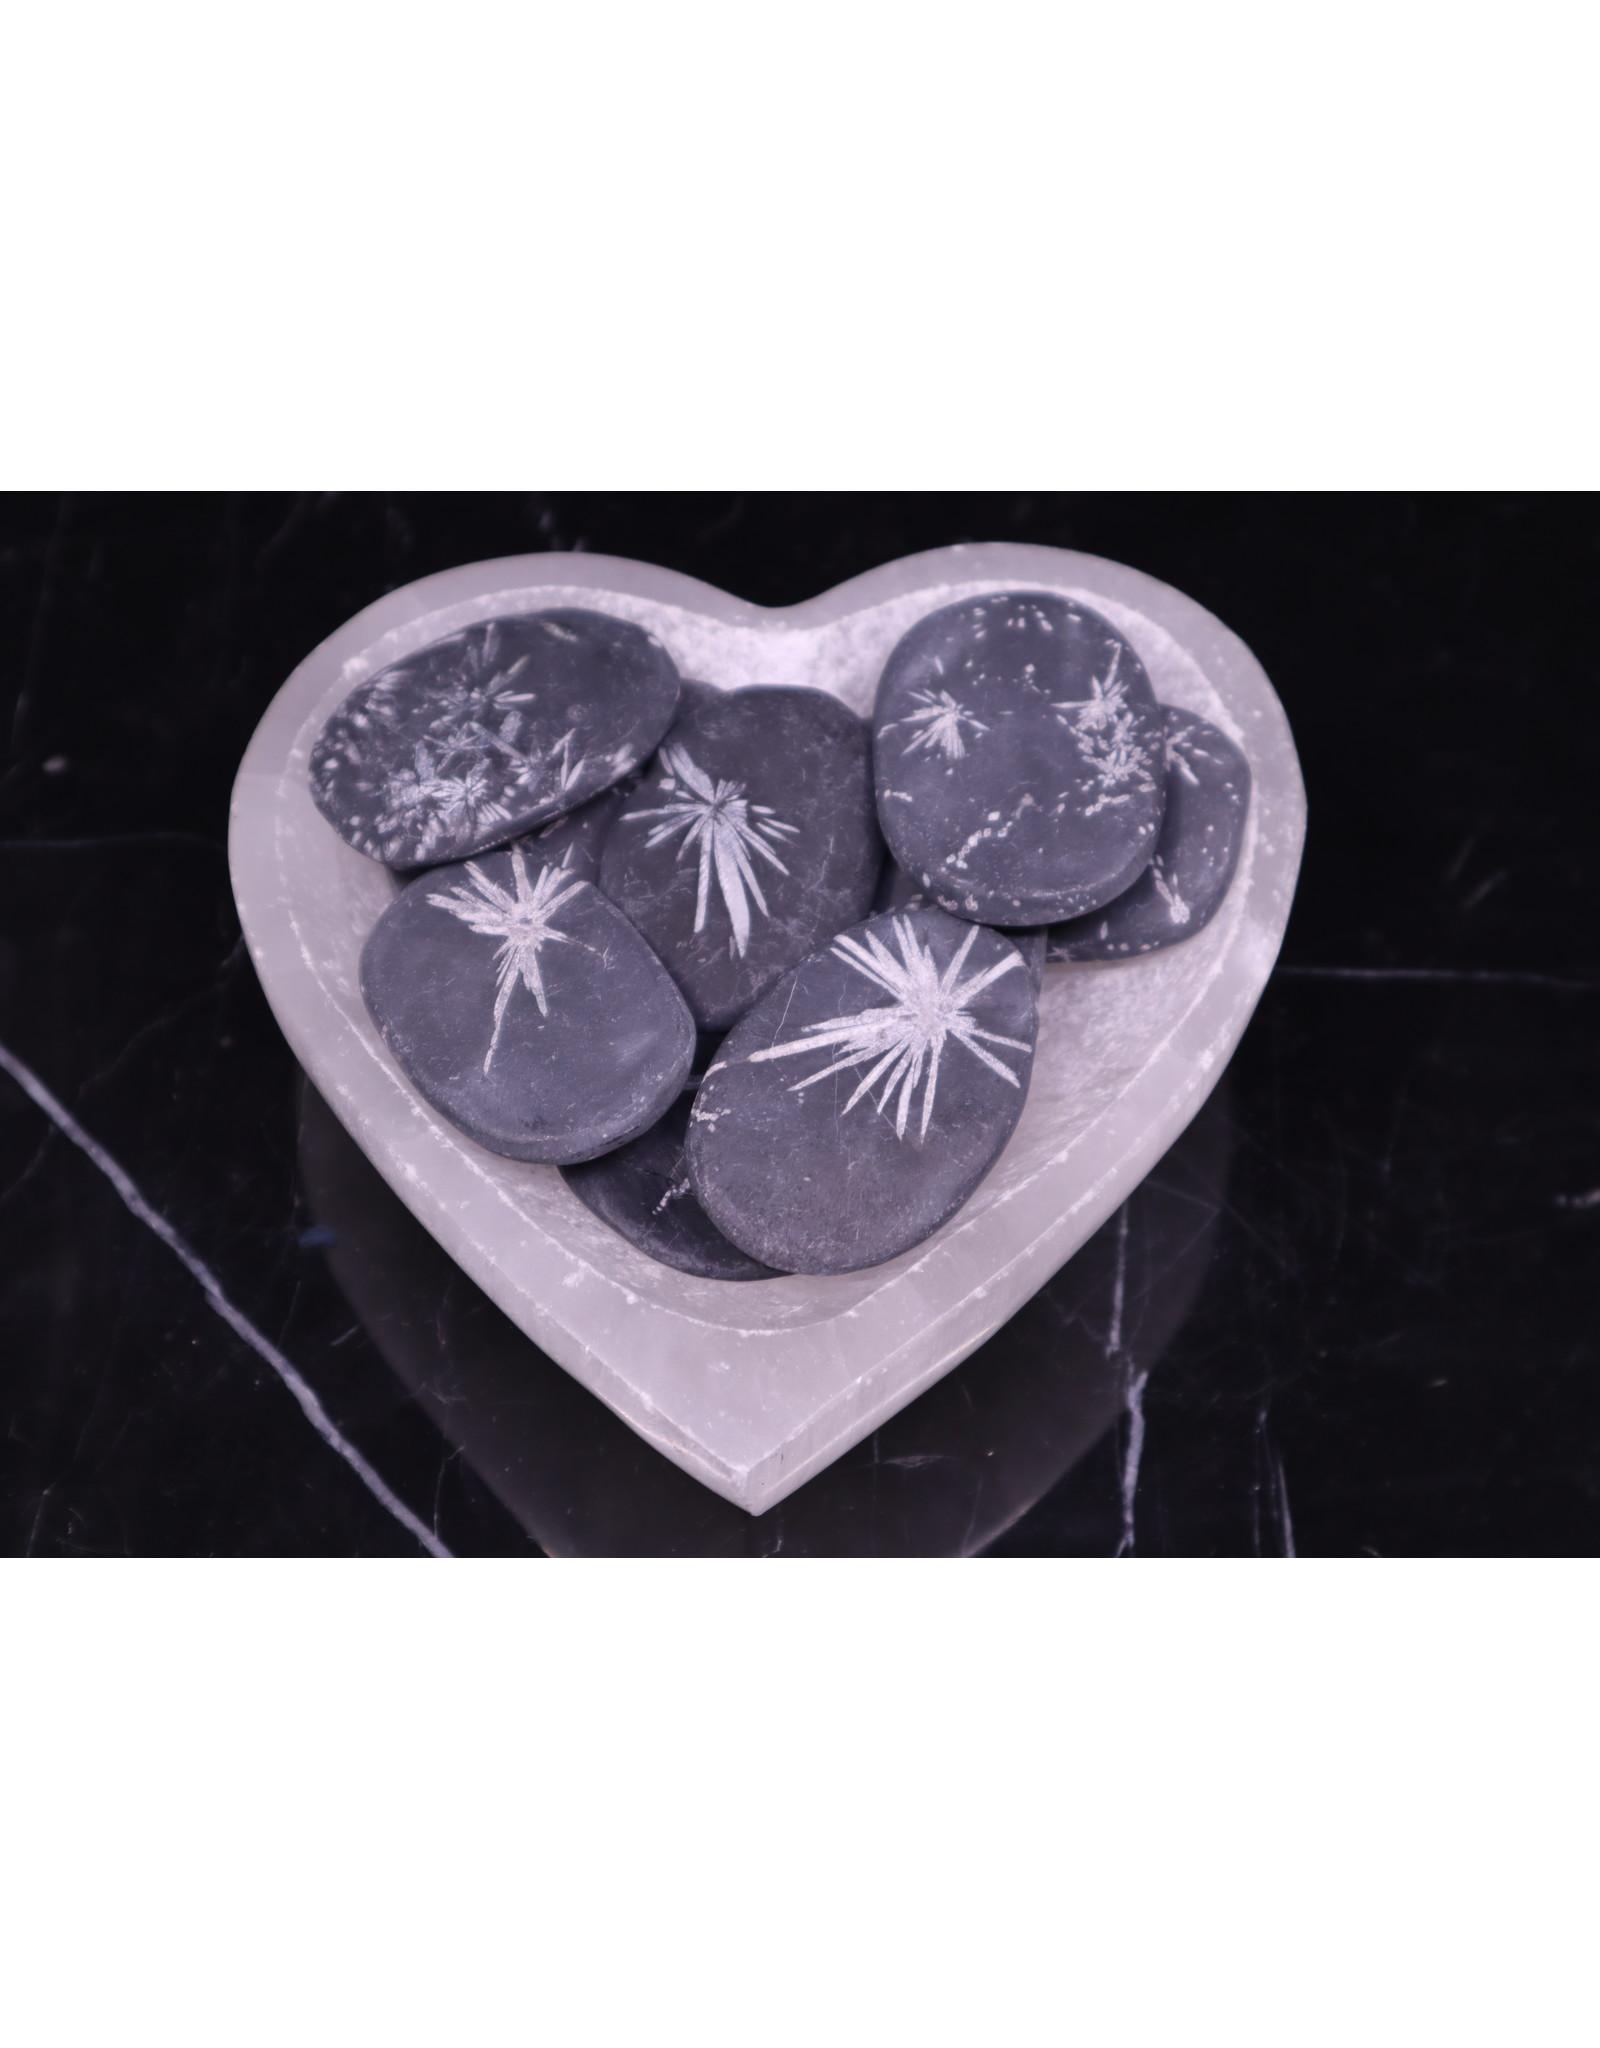 Chrysanthemum Palm/Pillow Stones